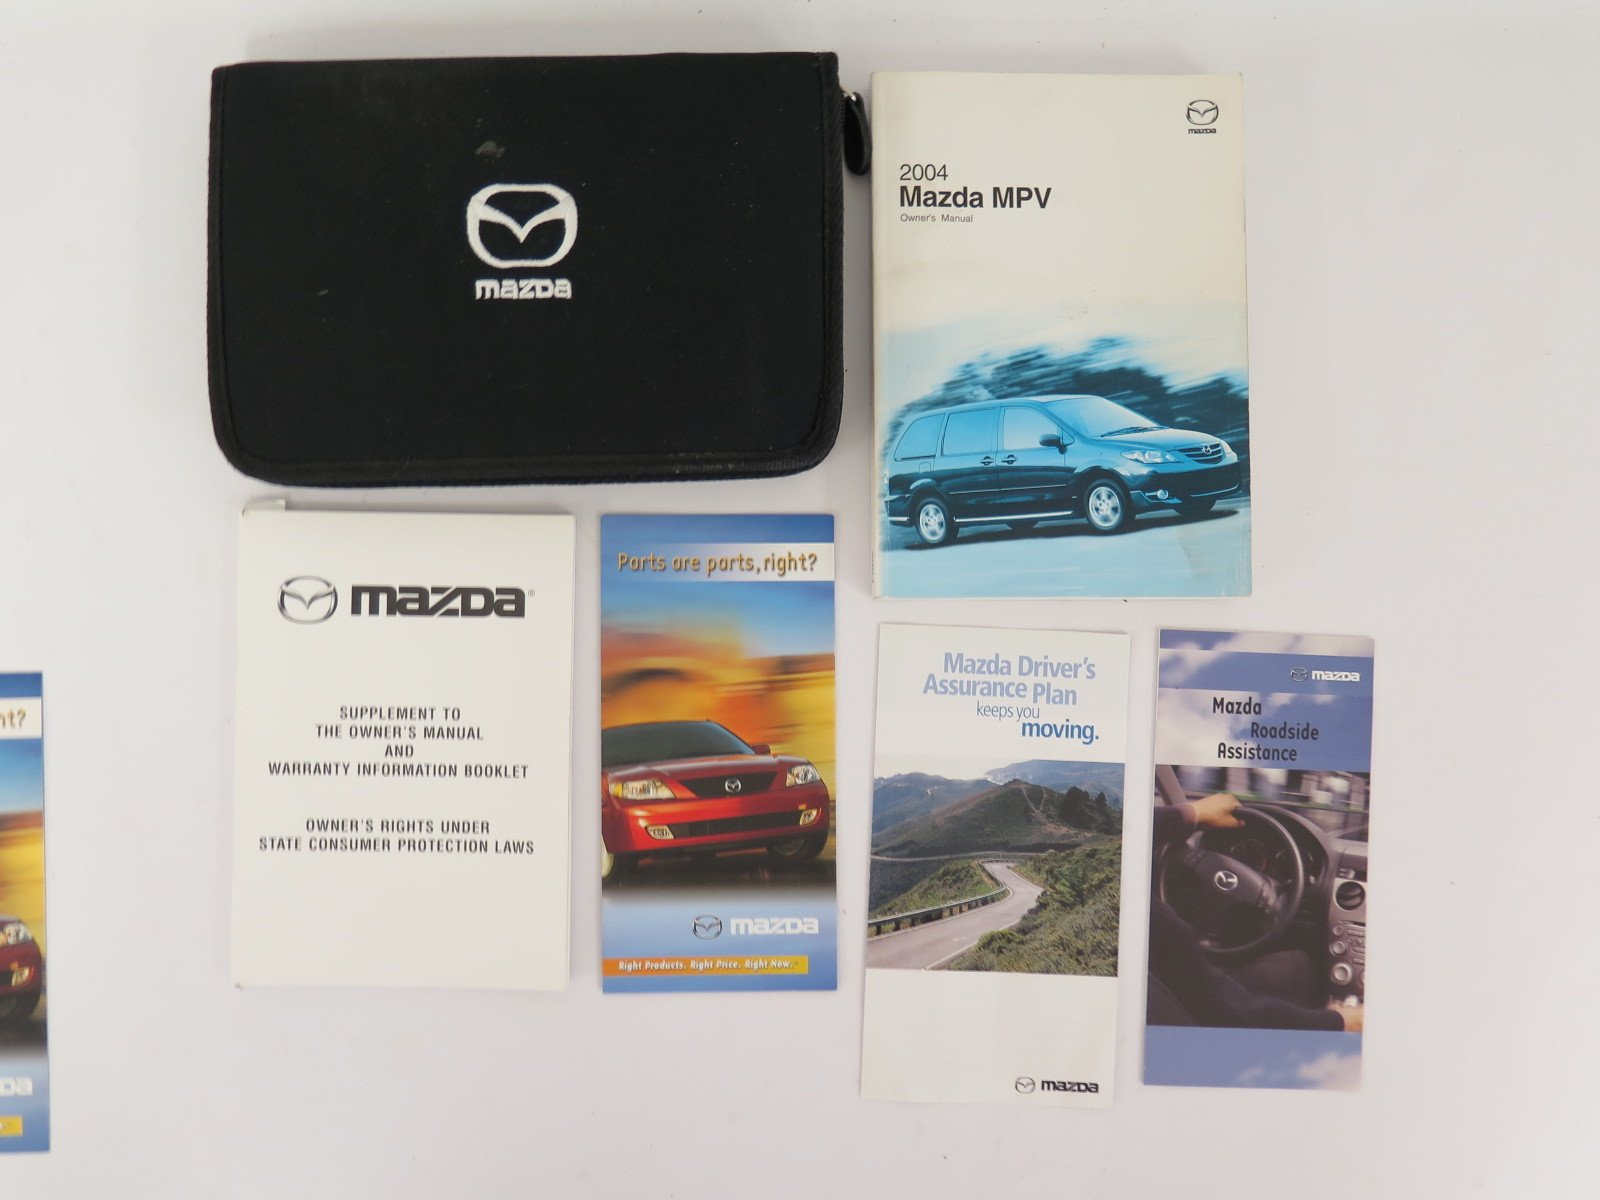 Mazda Mpv Owners Manual 2004 2006 Wiring Diagram 97 Buick Lesabre Engine